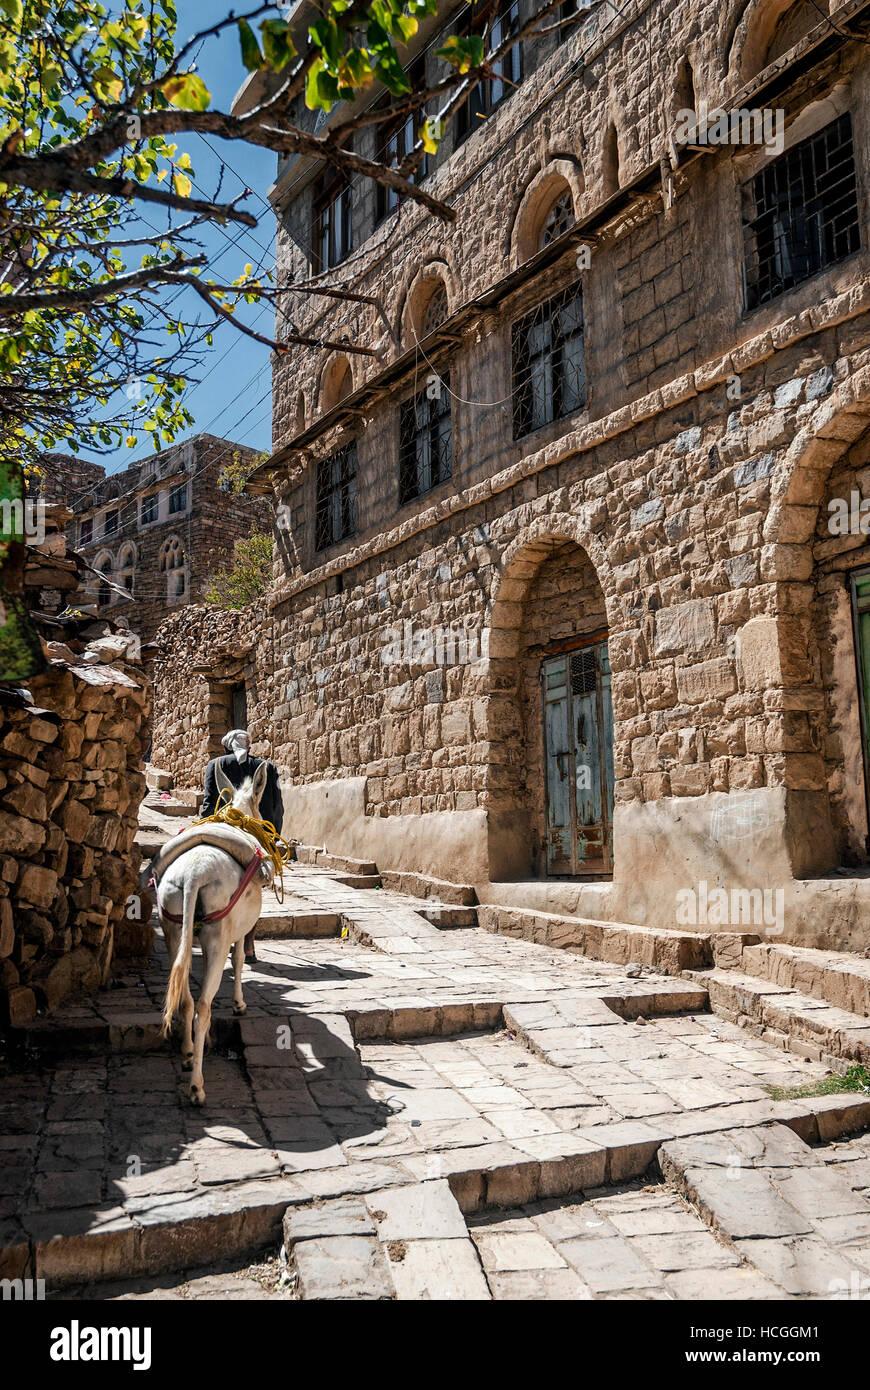 street in traditional old yemeni heritage shibam village near sanaa yemen - Stock Image